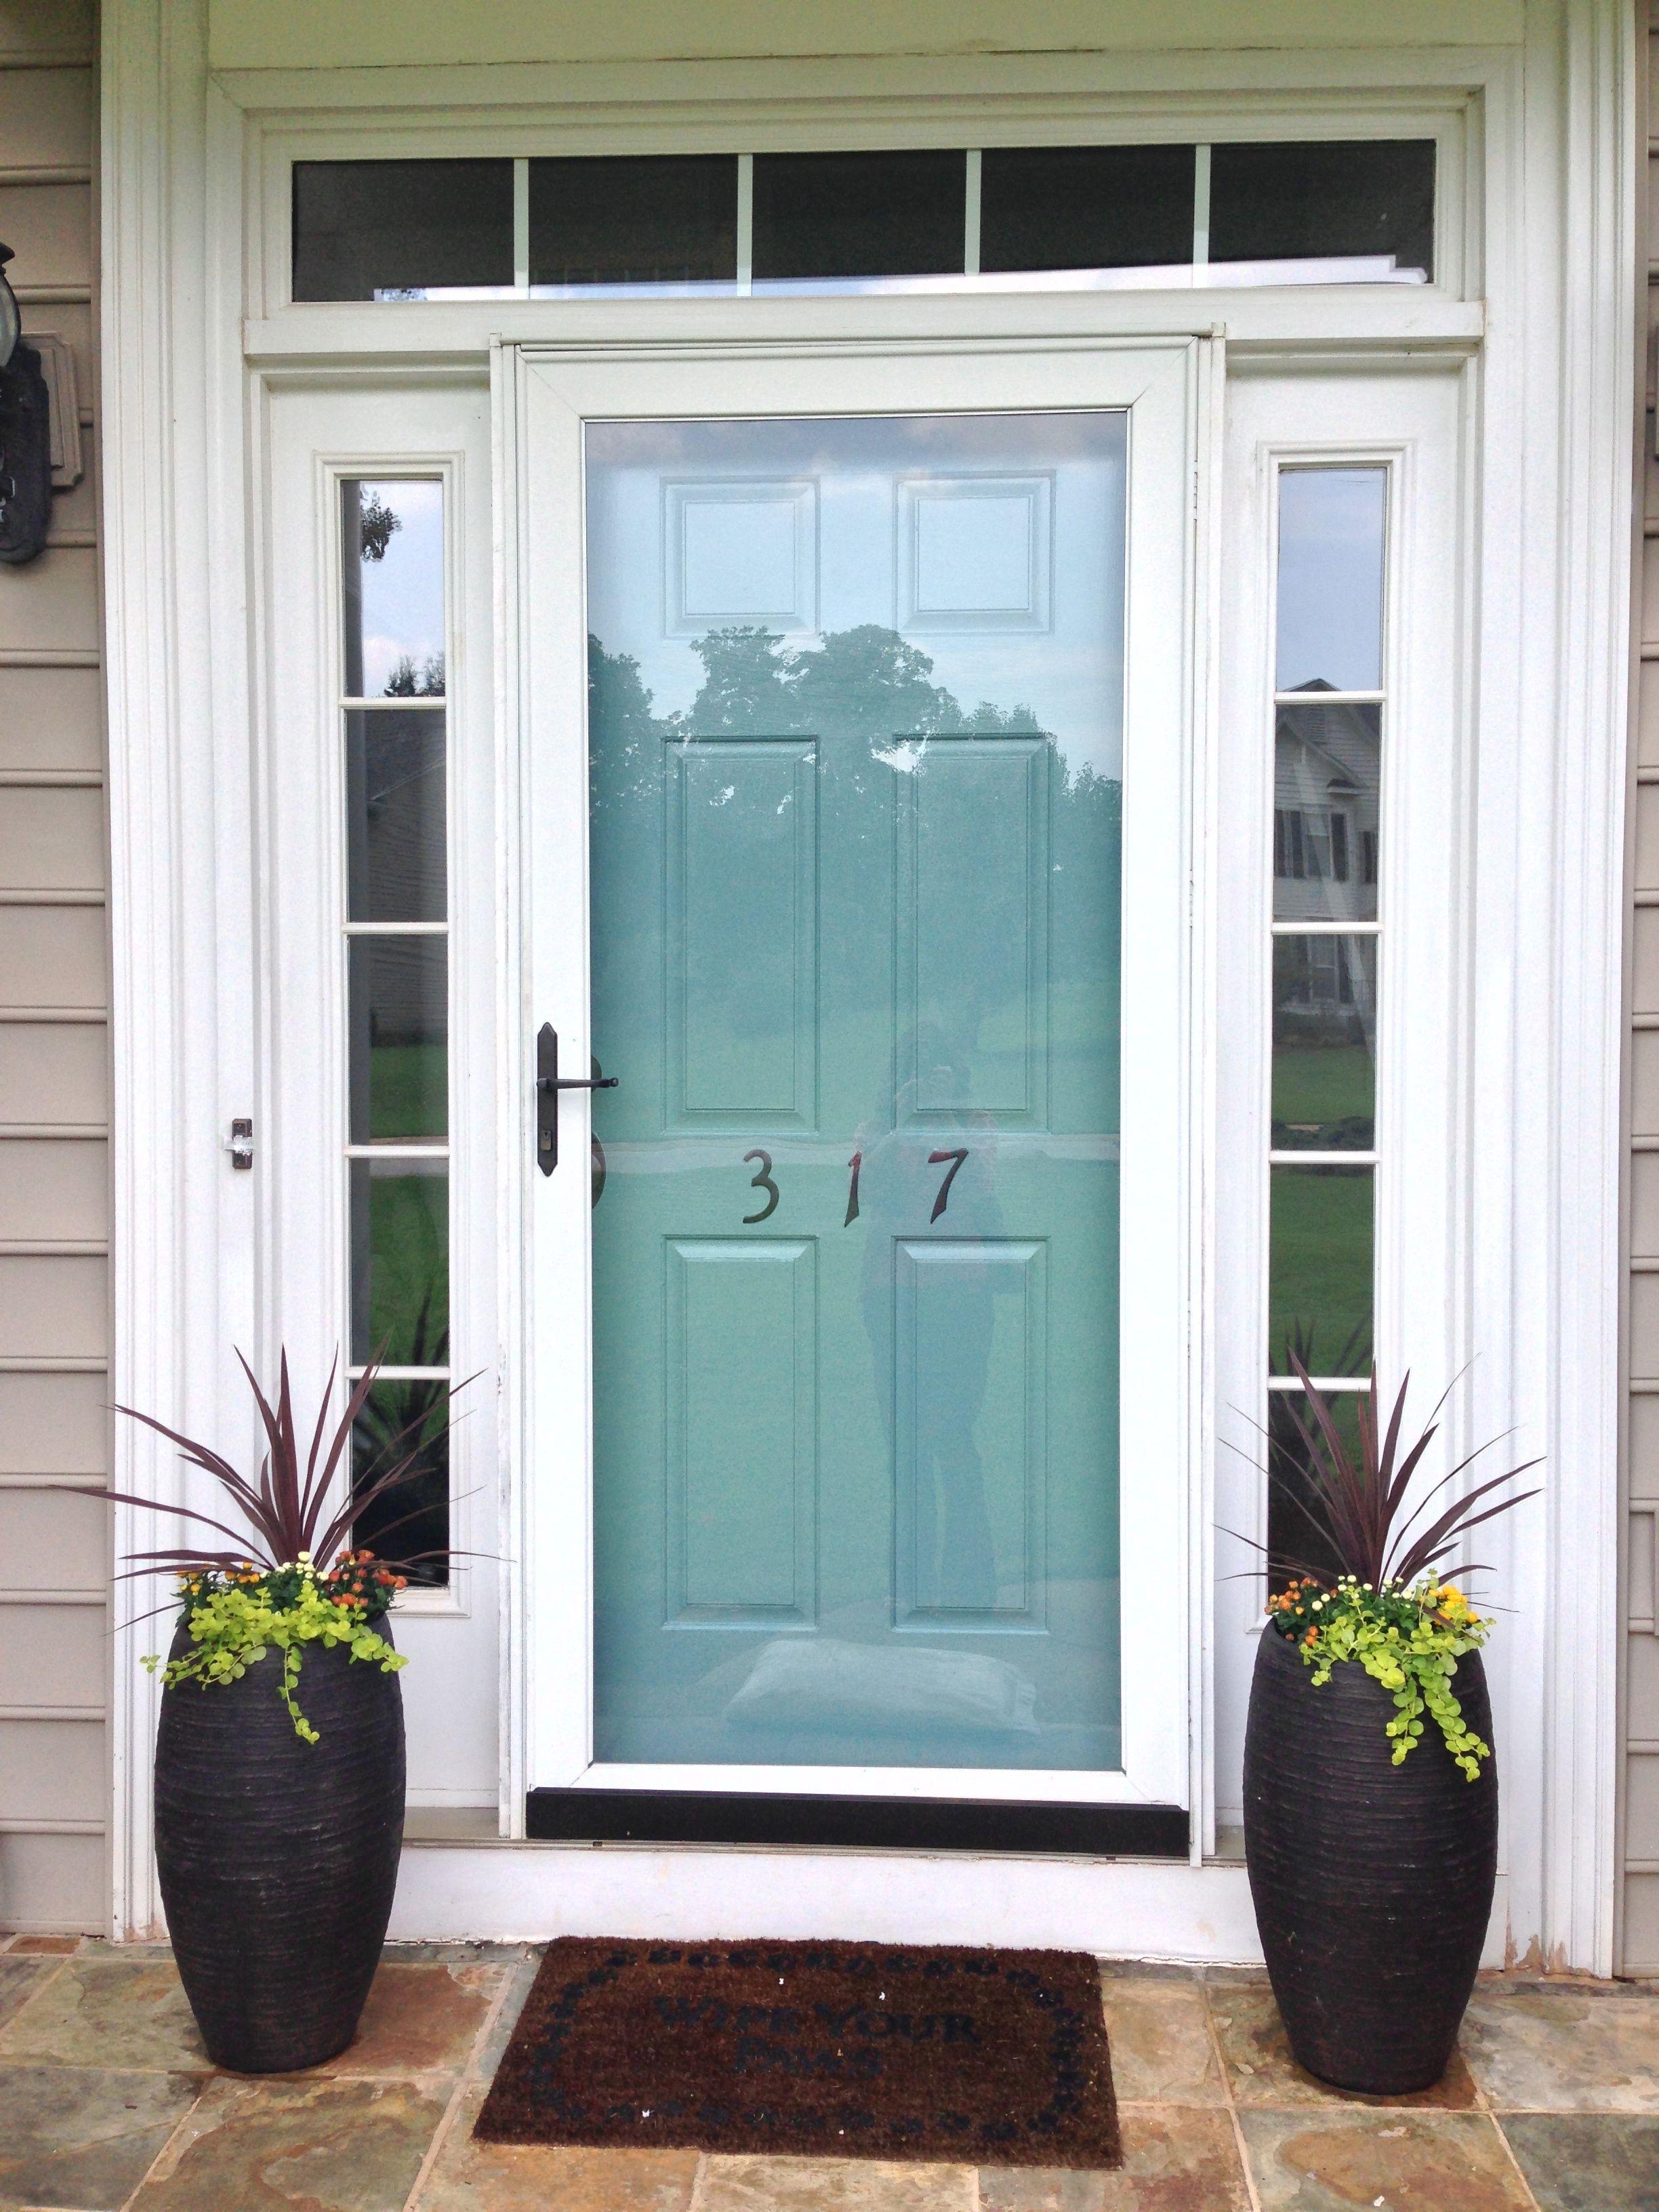 Valspar Turquoise Spray Paint The Door Was Black I Used Valsparwillow Juniper And Spray